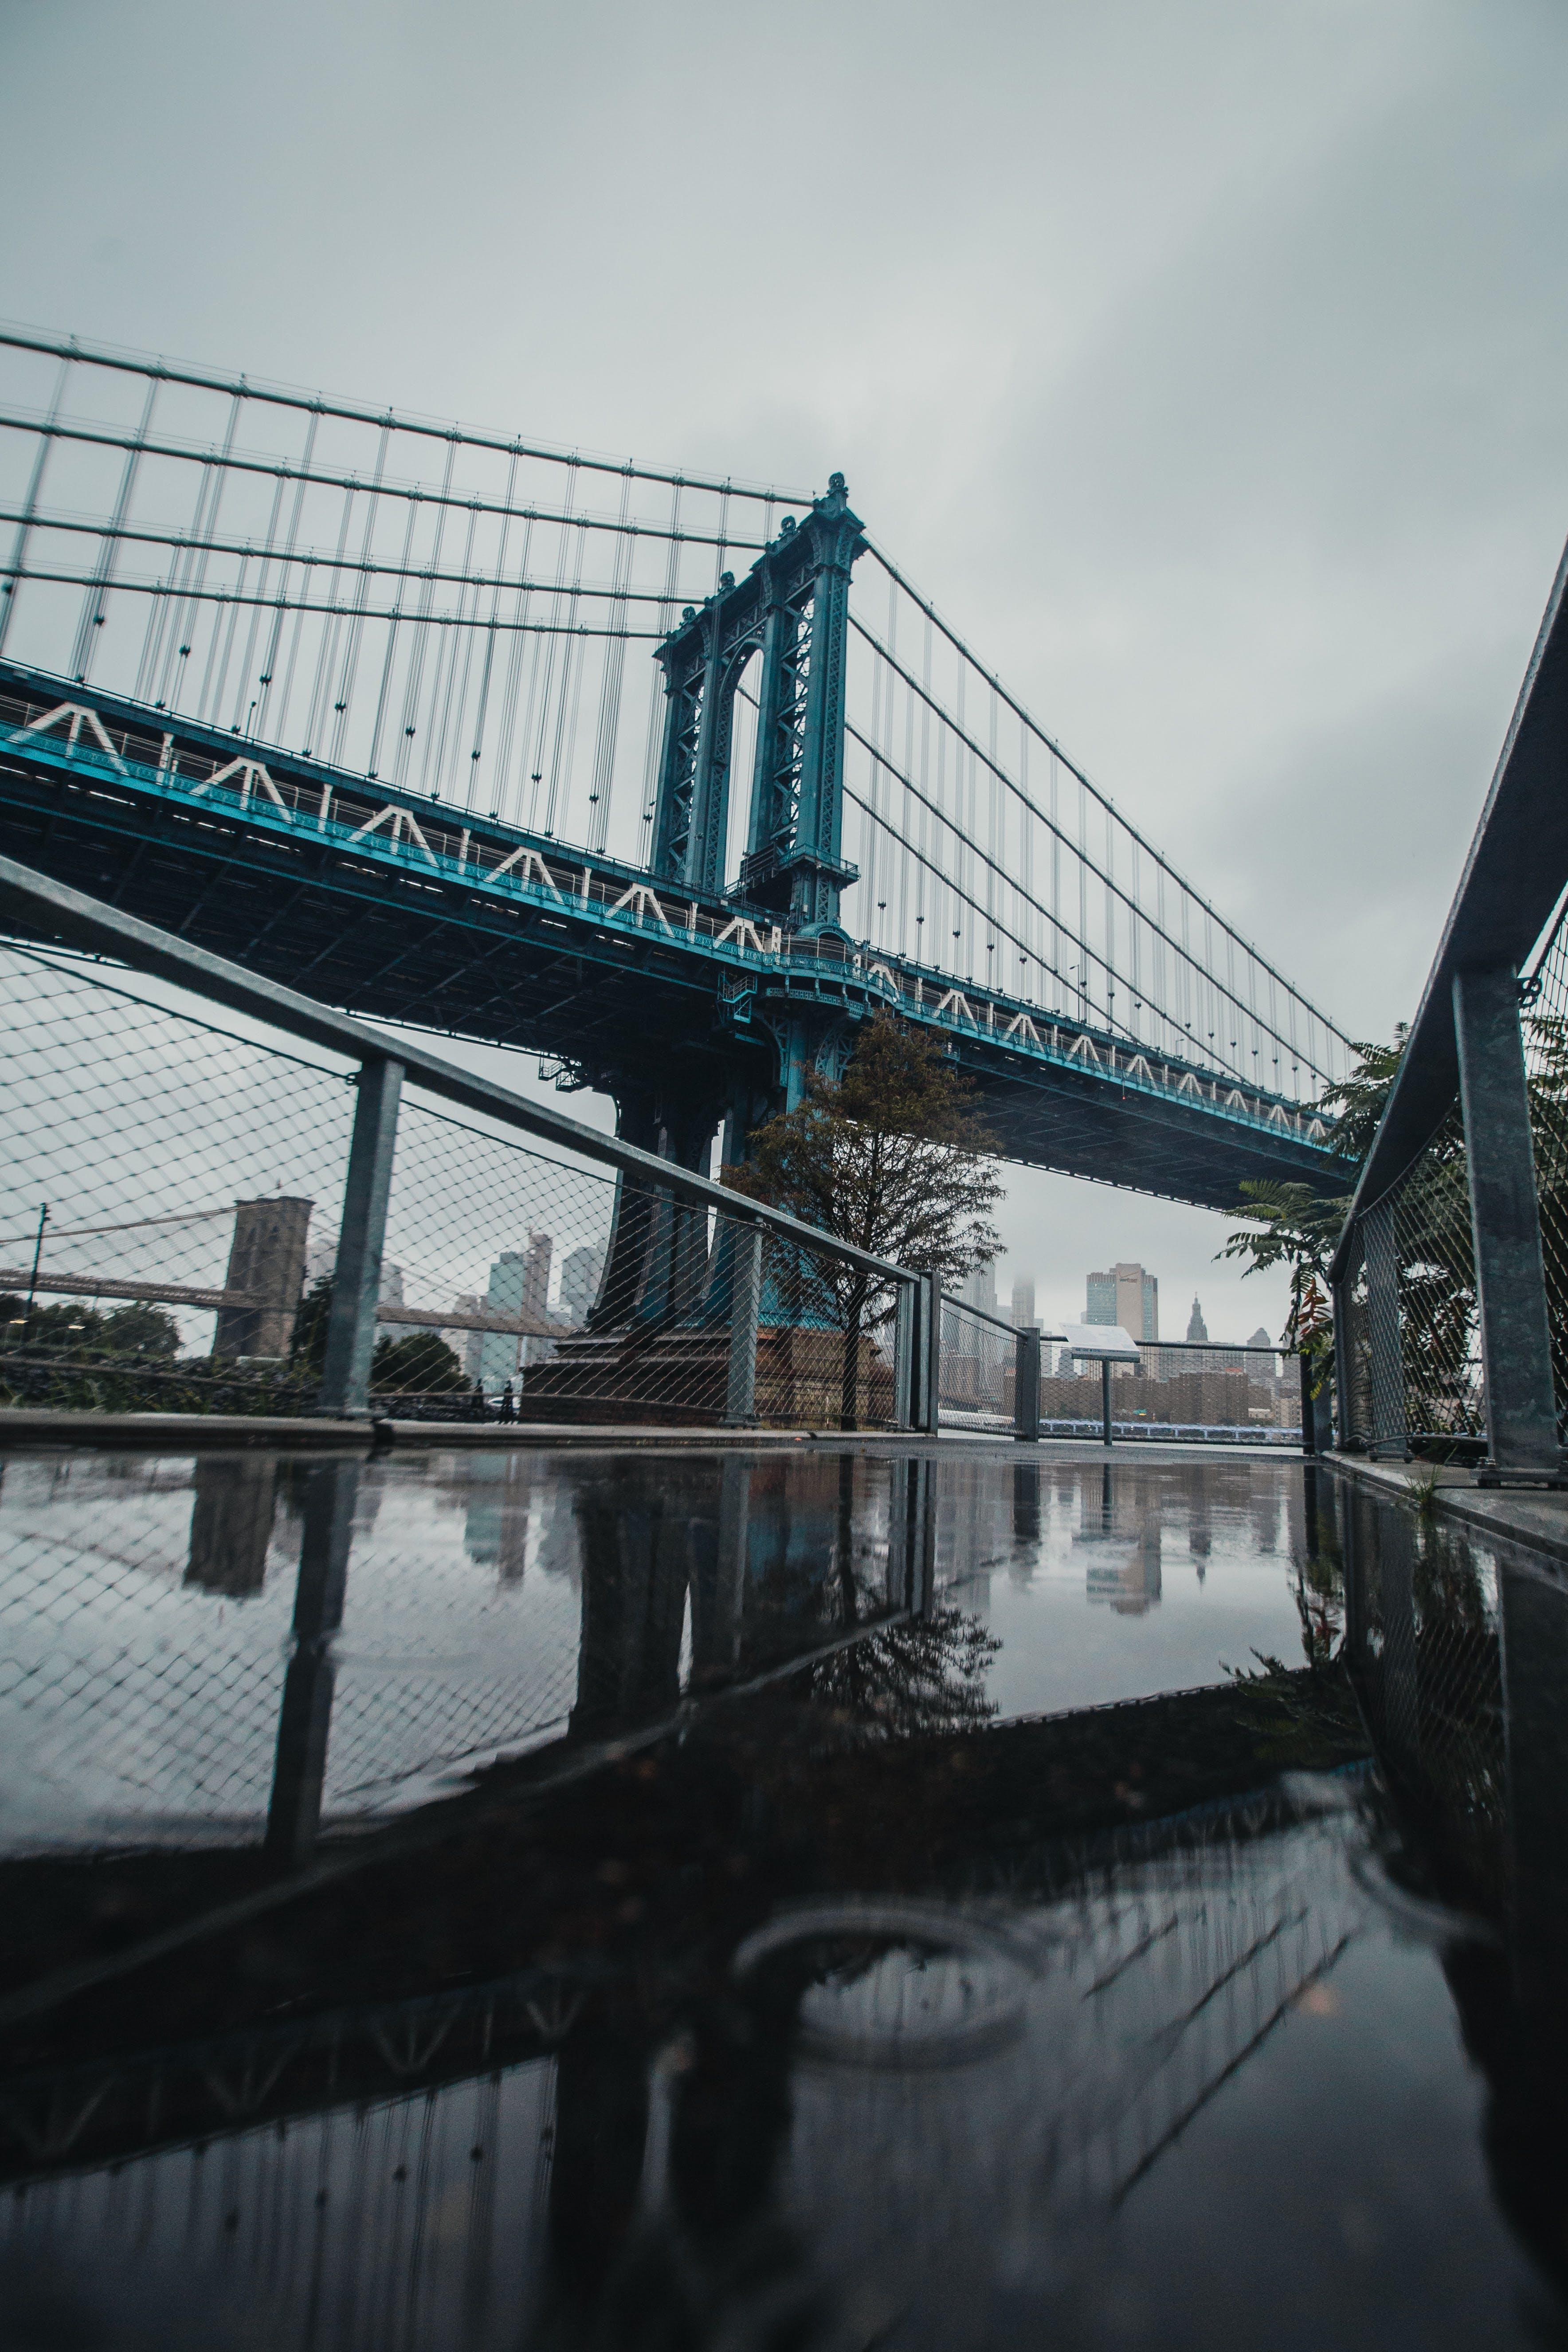 Suspension Bridge Near Body Of Water